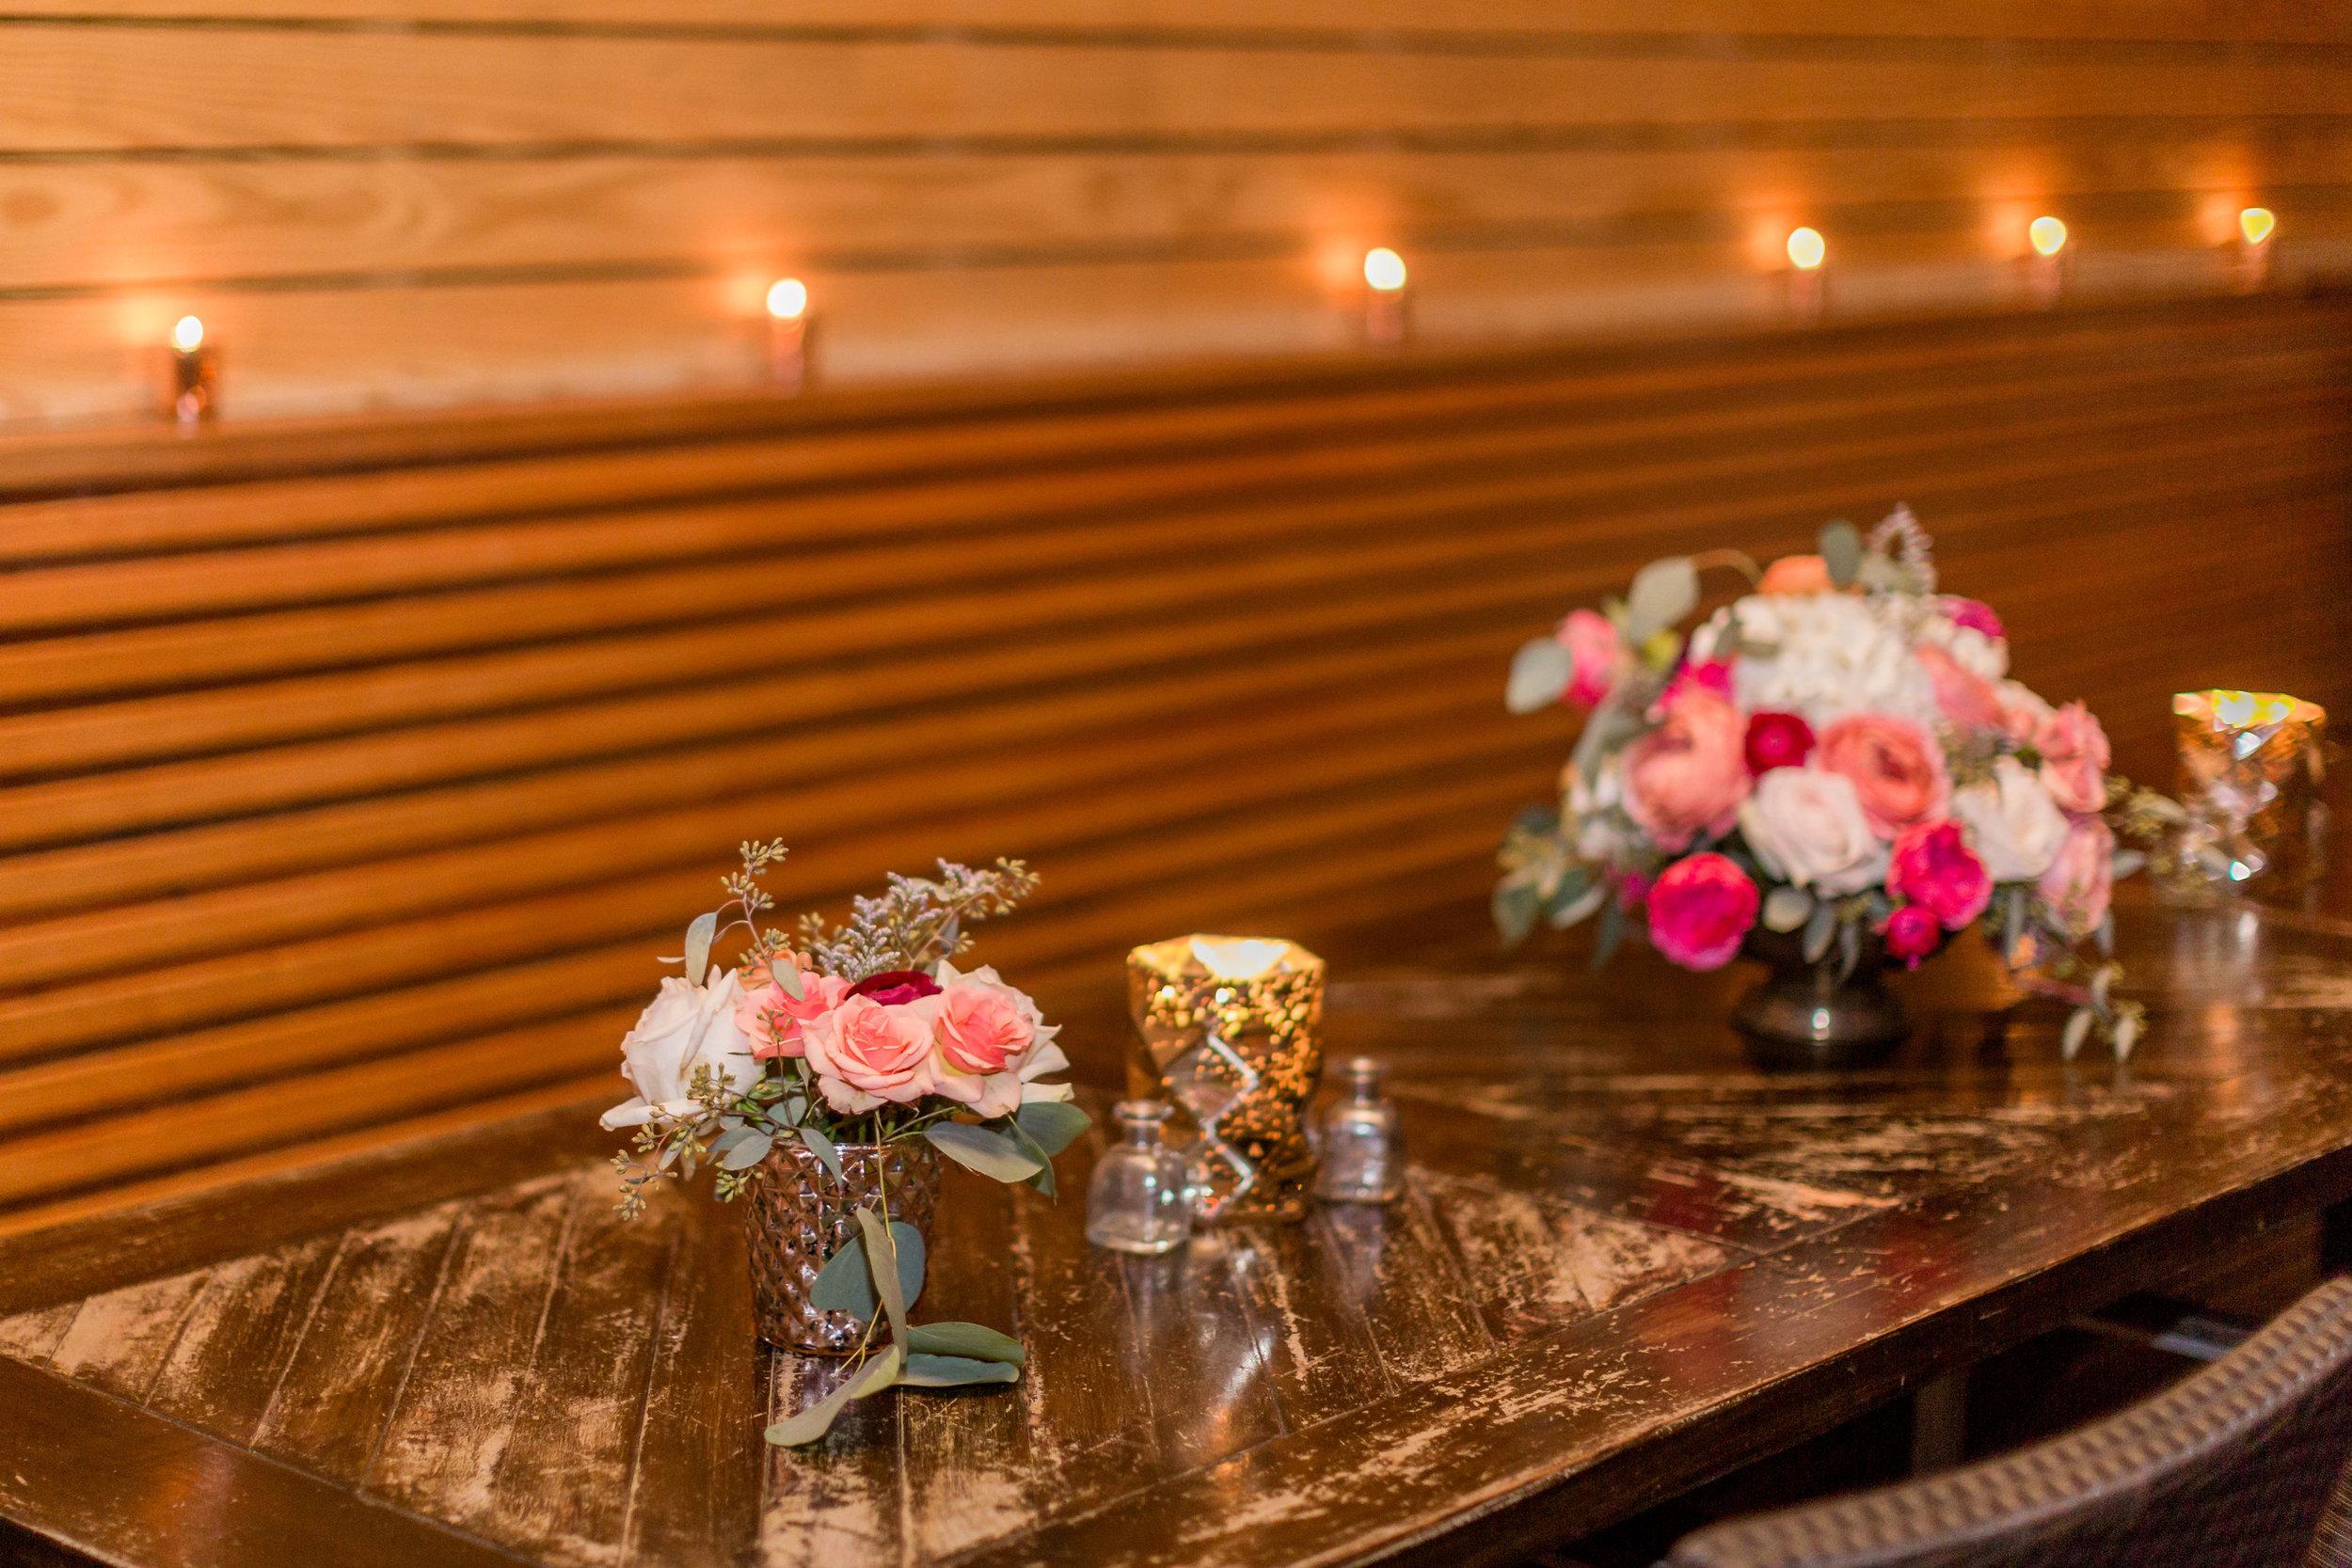 charleston new years elopement popup surprise wedding at upstairs at midtown - scarlet plan & design wedding planners (347).jpg